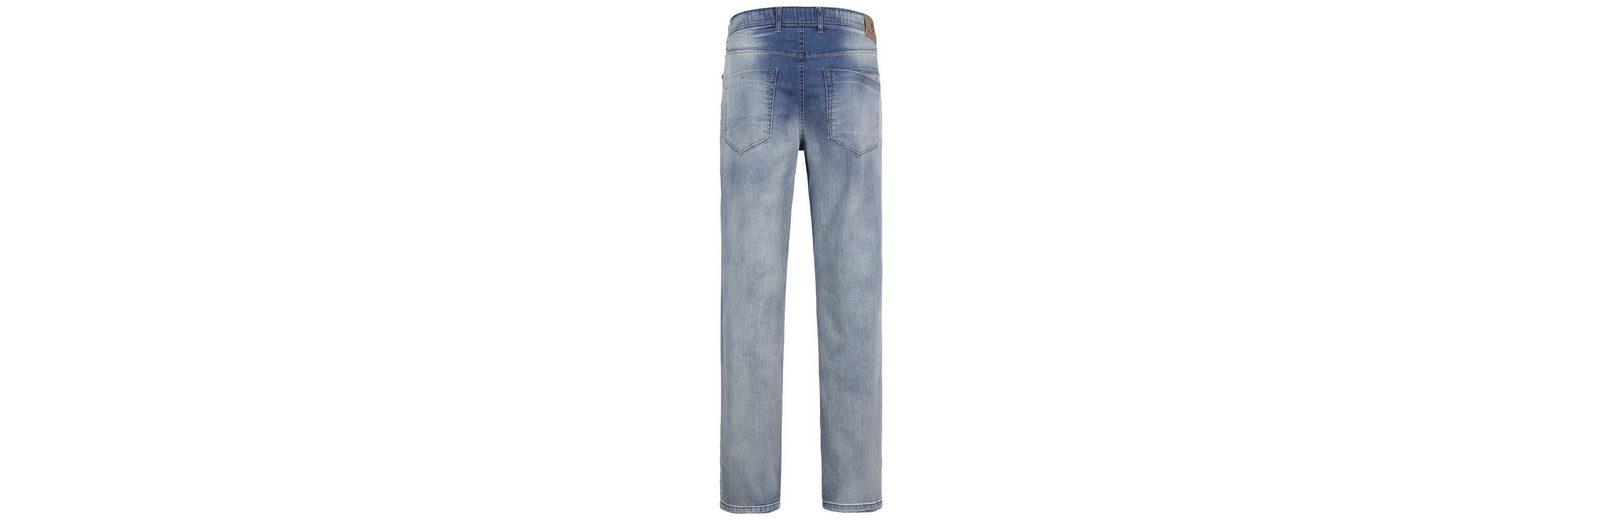 Jan Vanderstorm 5-Pocket-Jeans THYRON Bester Ort whiljaMke